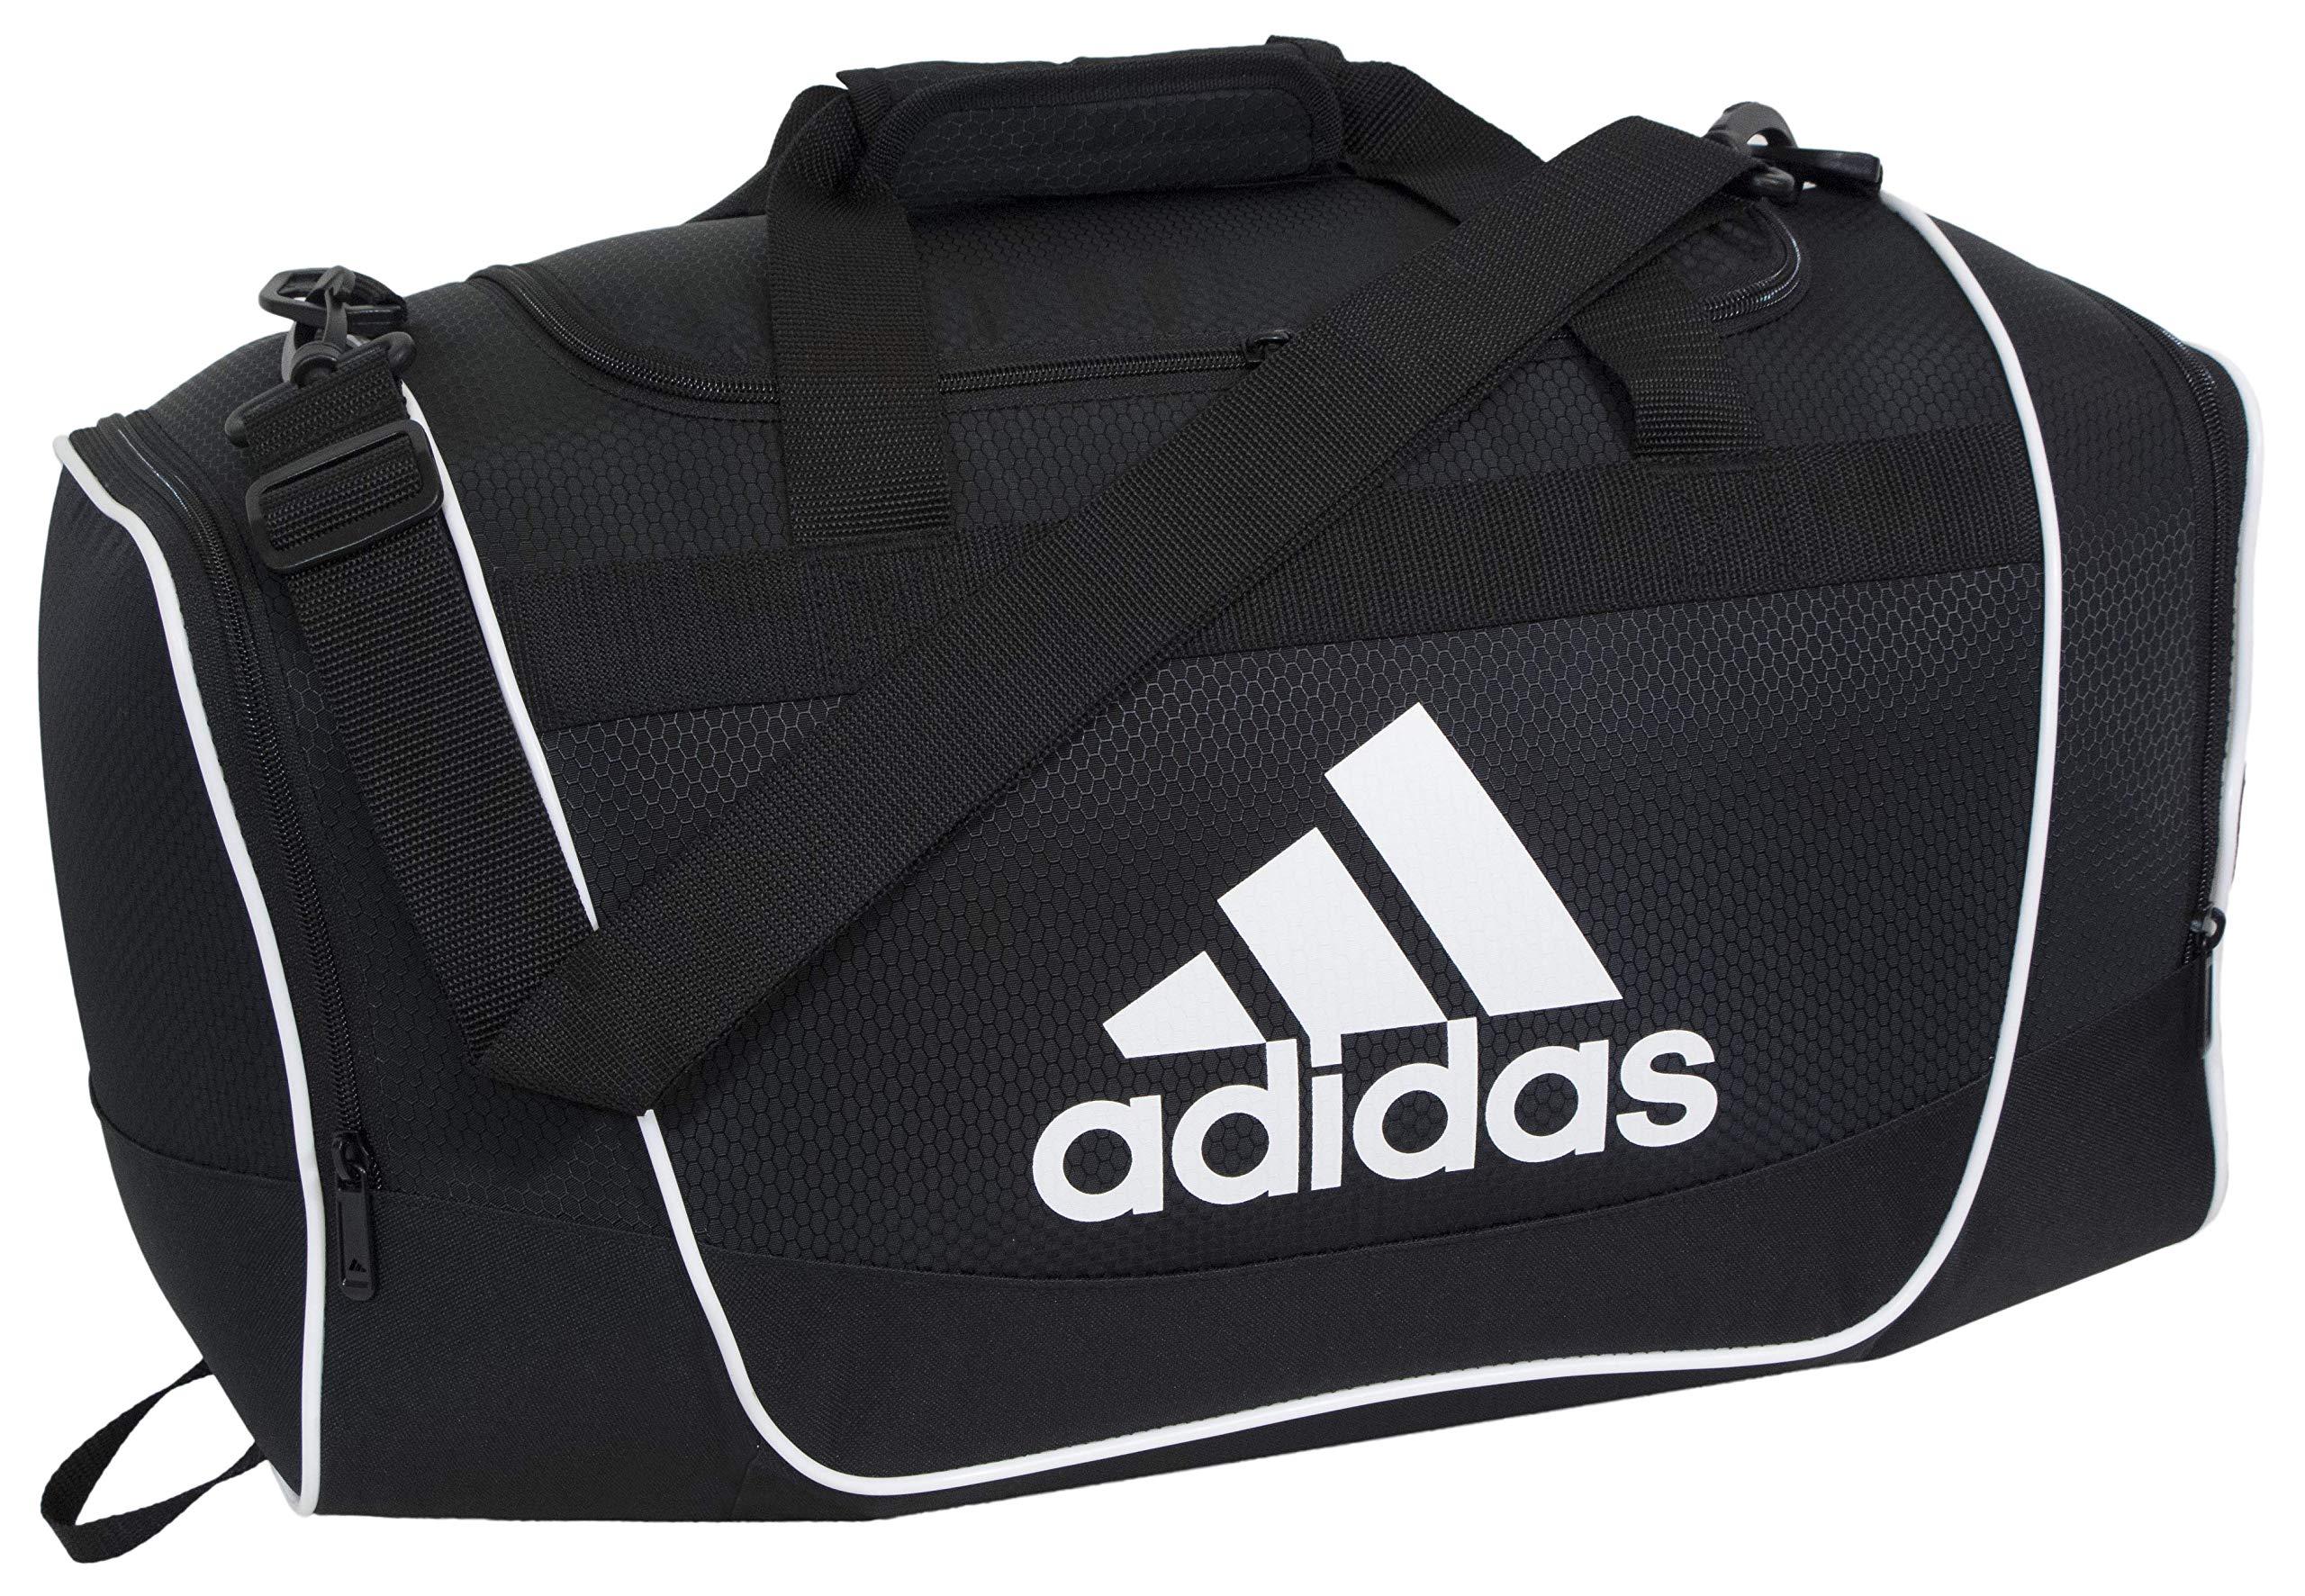 adidas Unisex Defender II Large Duffel Bag, Black, ONE SIZE by adidas